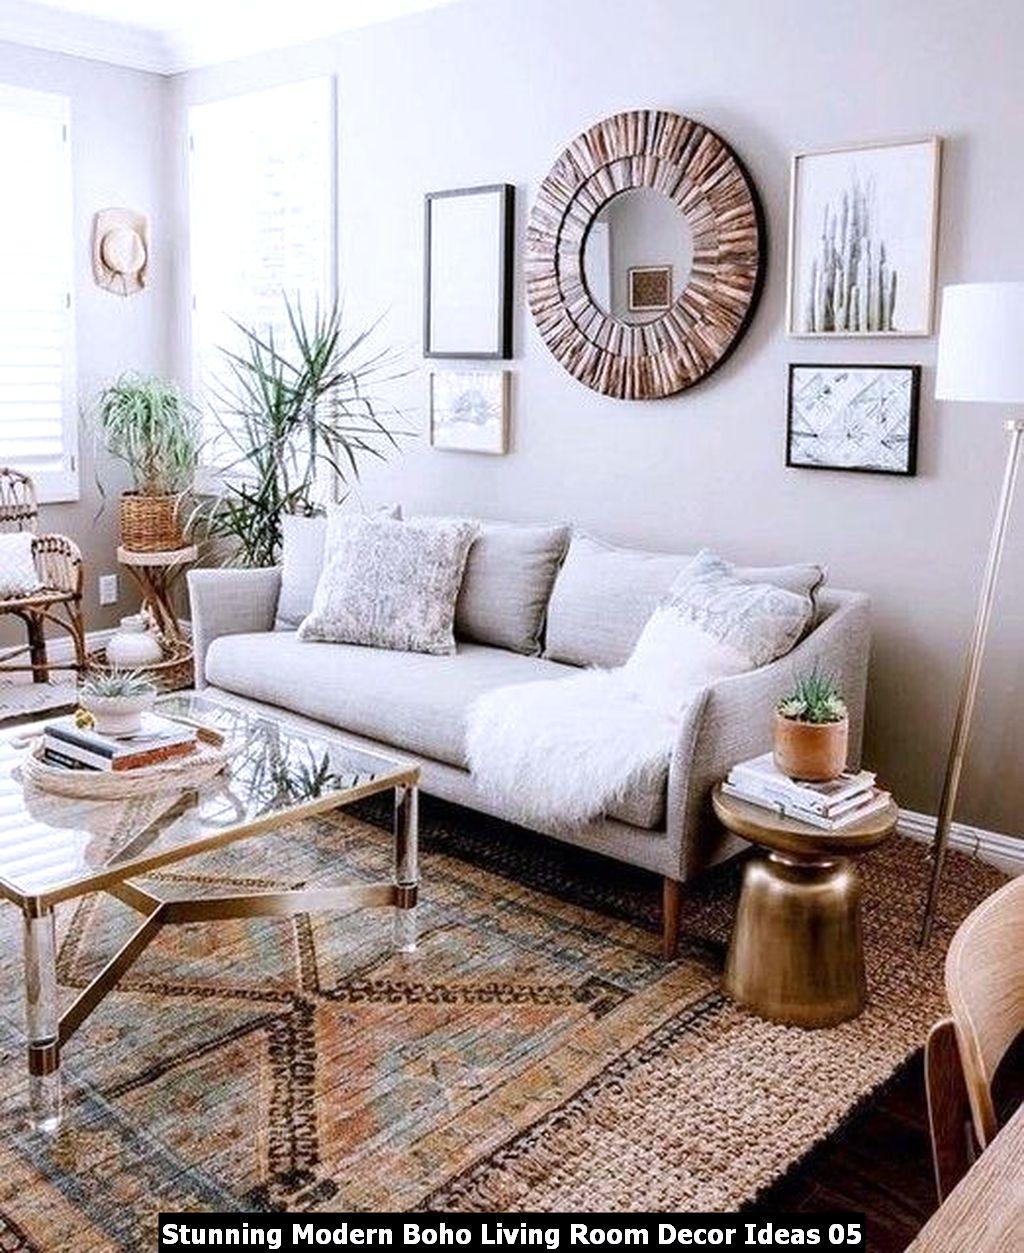 Stunning Modern Boho Living Room Decor Ideas 05